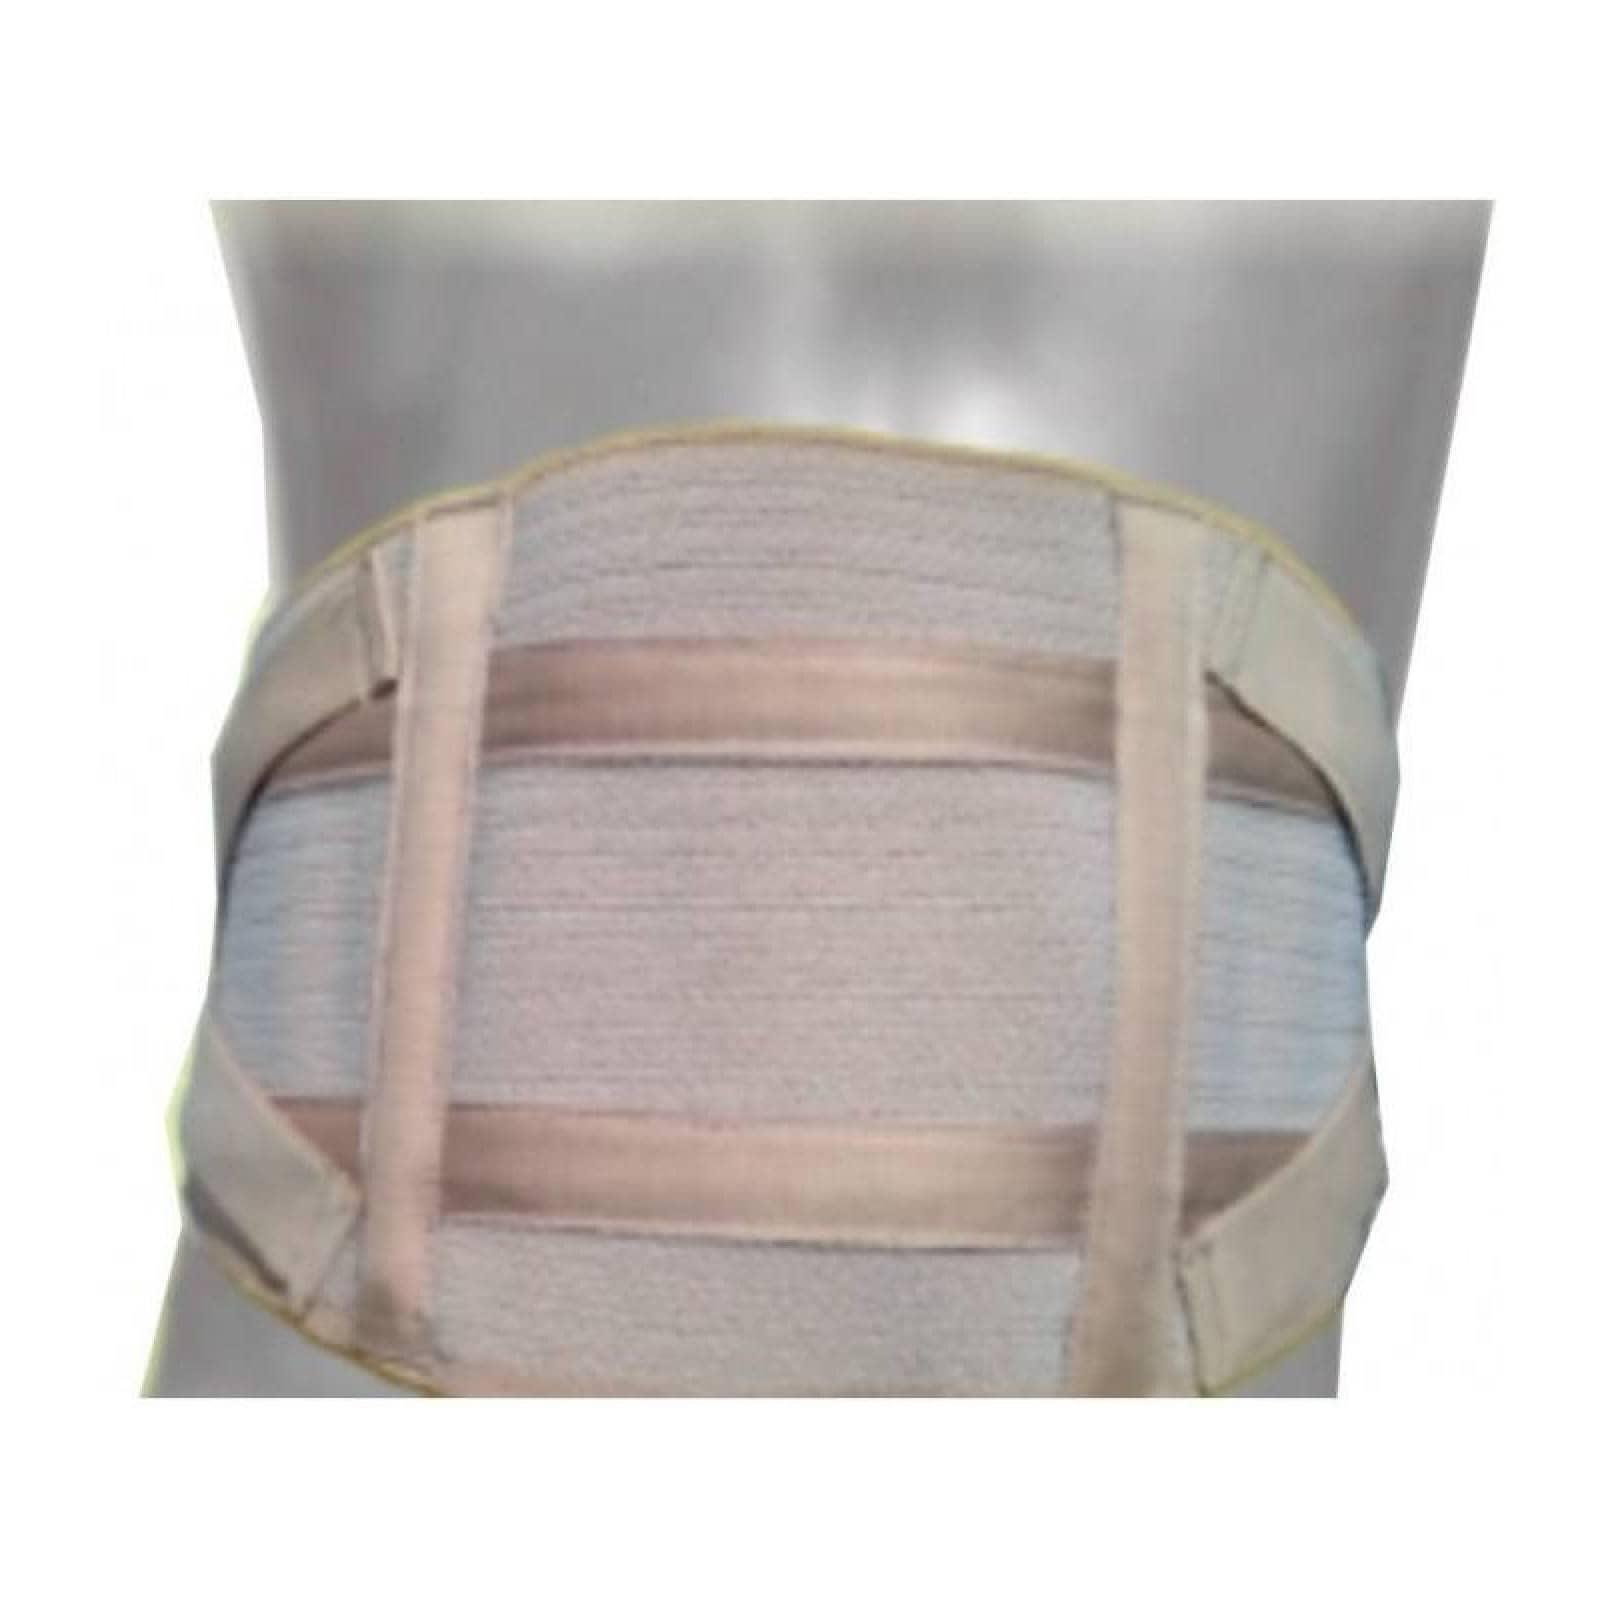 Faja para hernia umbilical con almohadilla